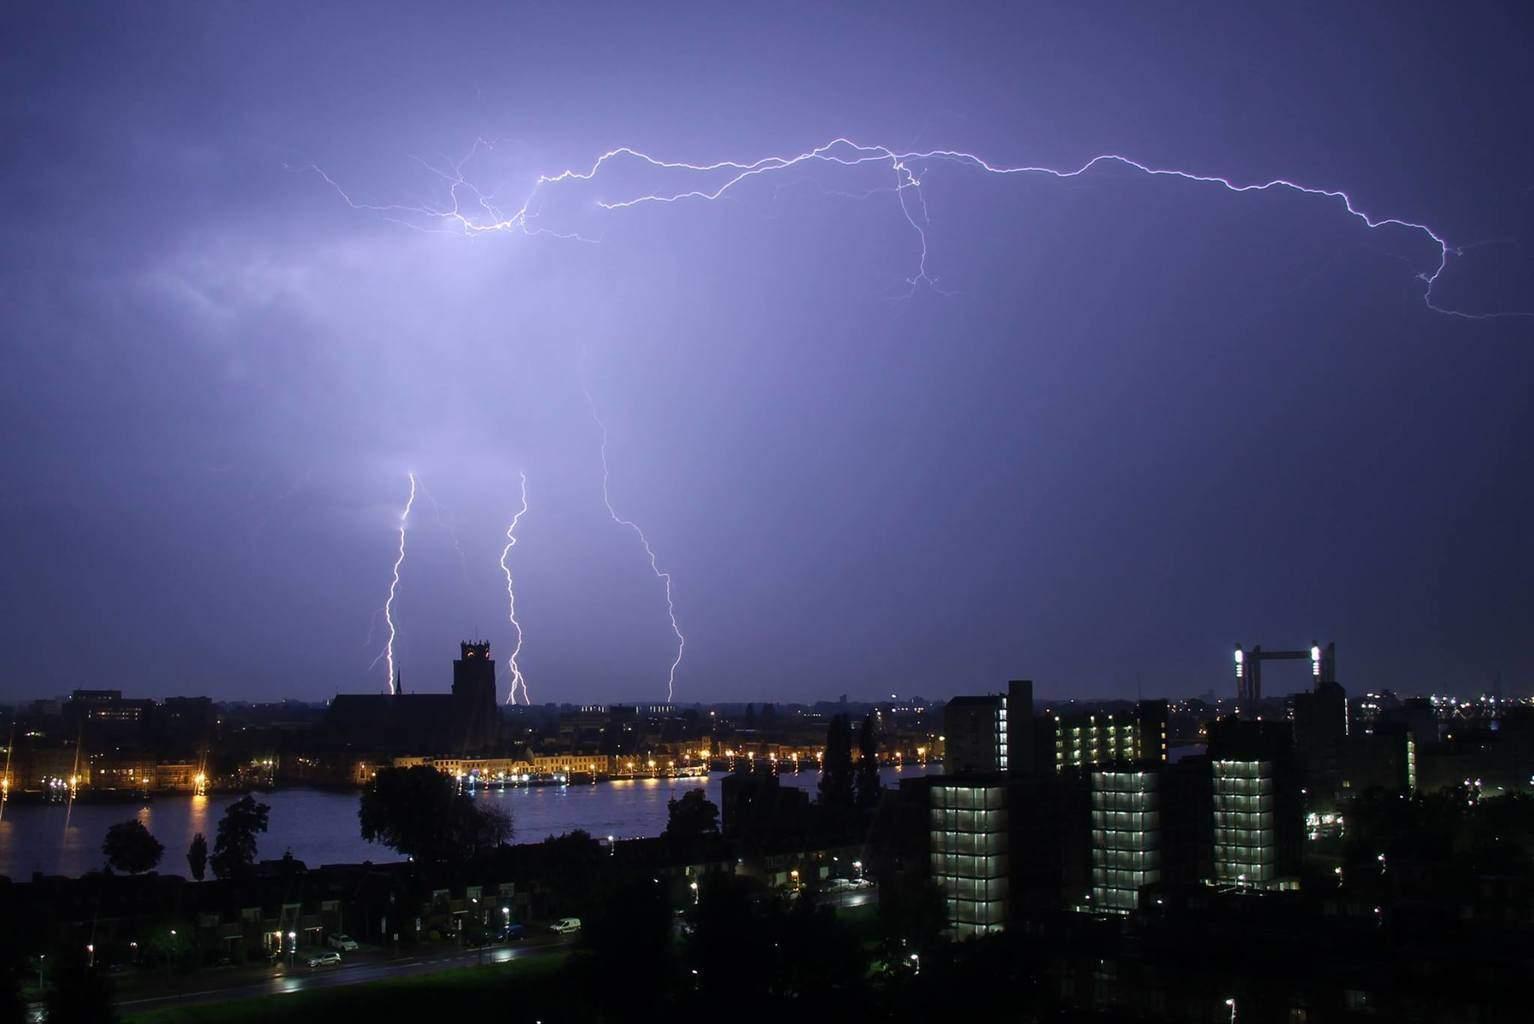 Strikes near Dordrecht last night (The Netherlands)